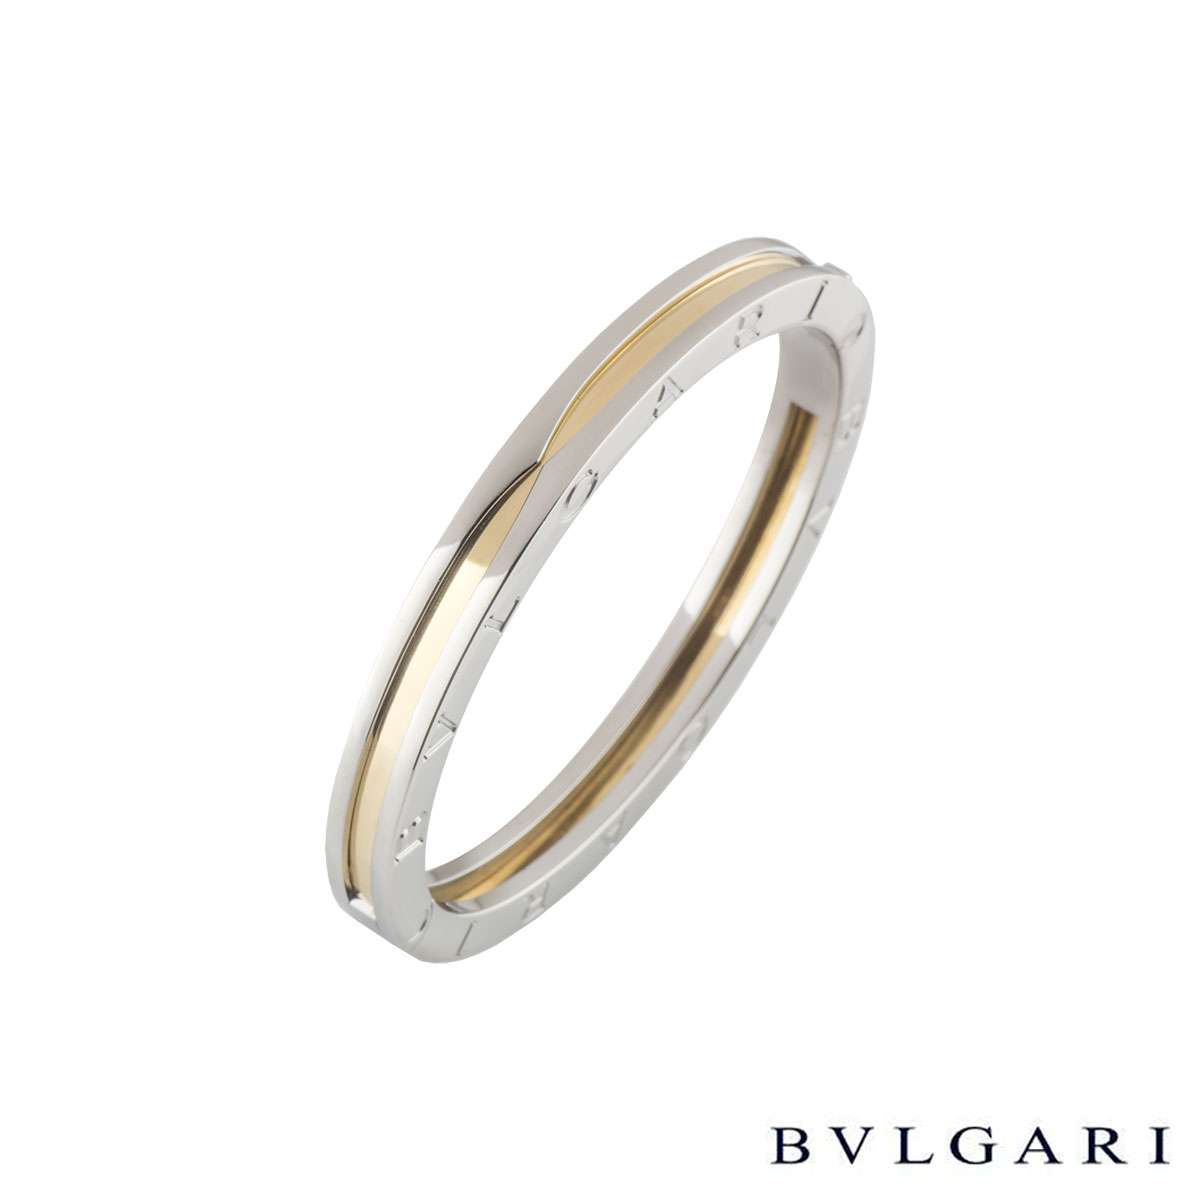 BvlgariSteel & Yellow Gold B.zero1 BraceletBR851334